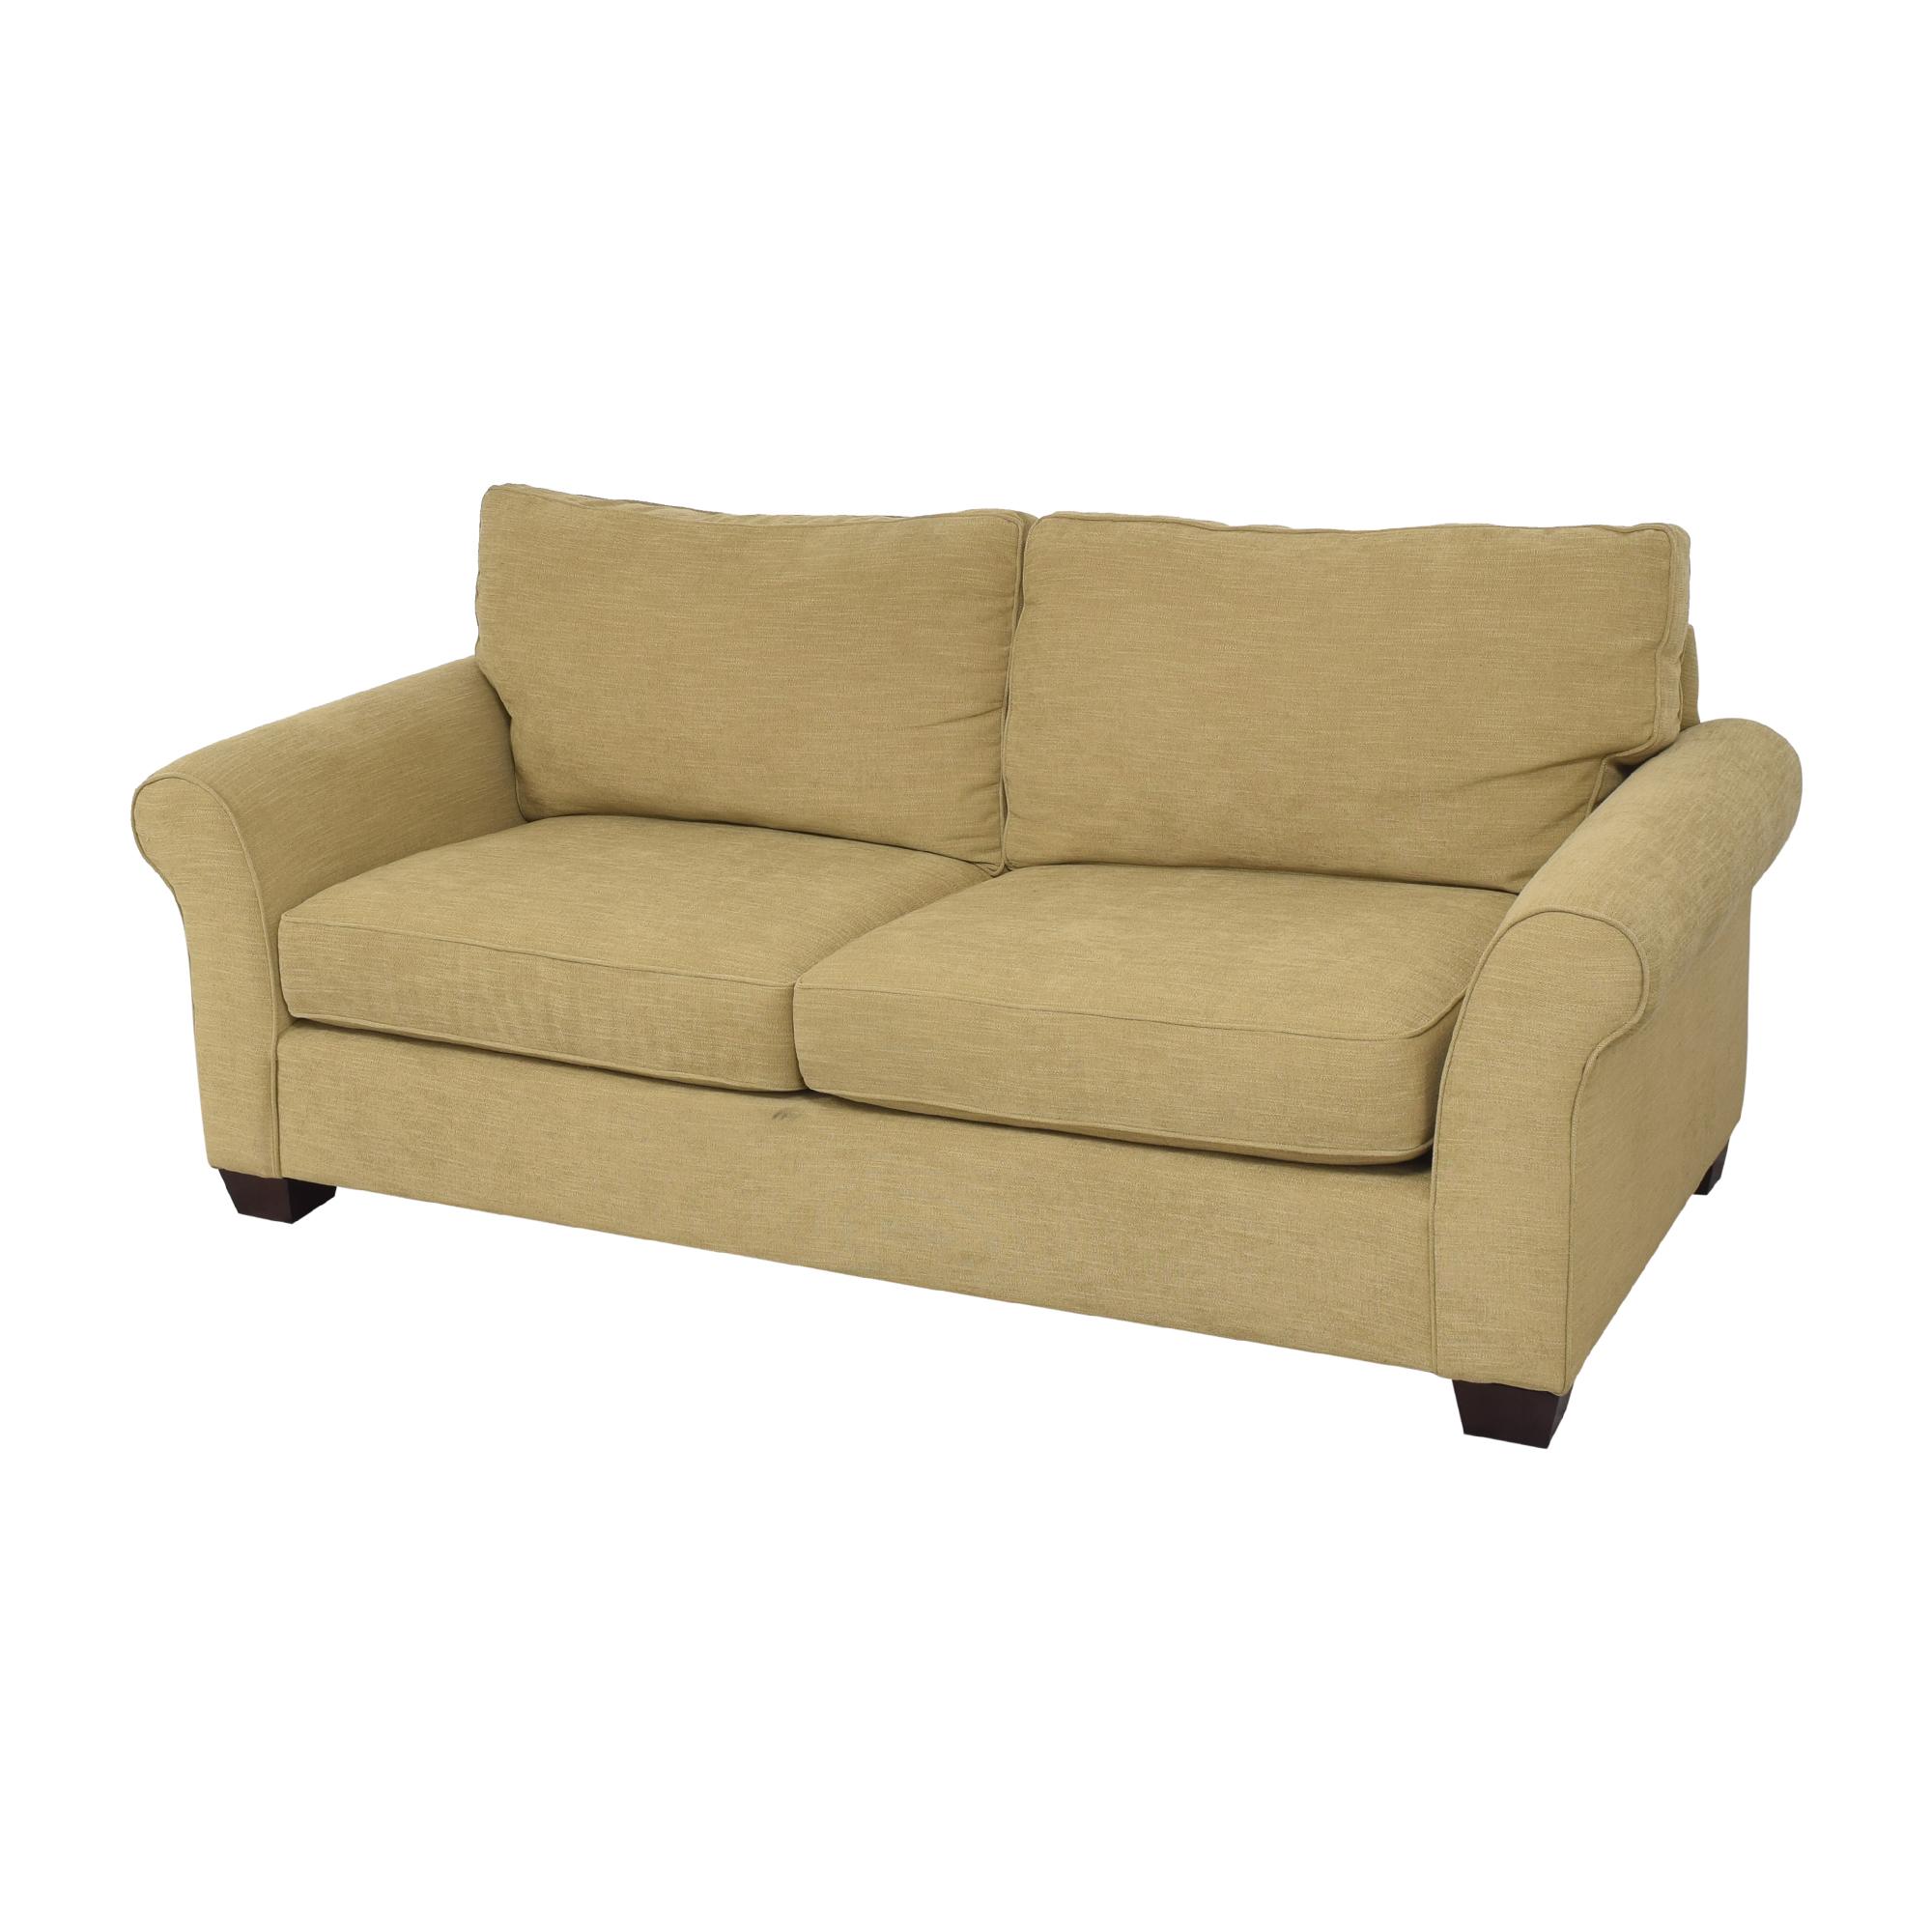 Pottery Barn Pottery Barn Comfort Roll Arm Sofa for sale